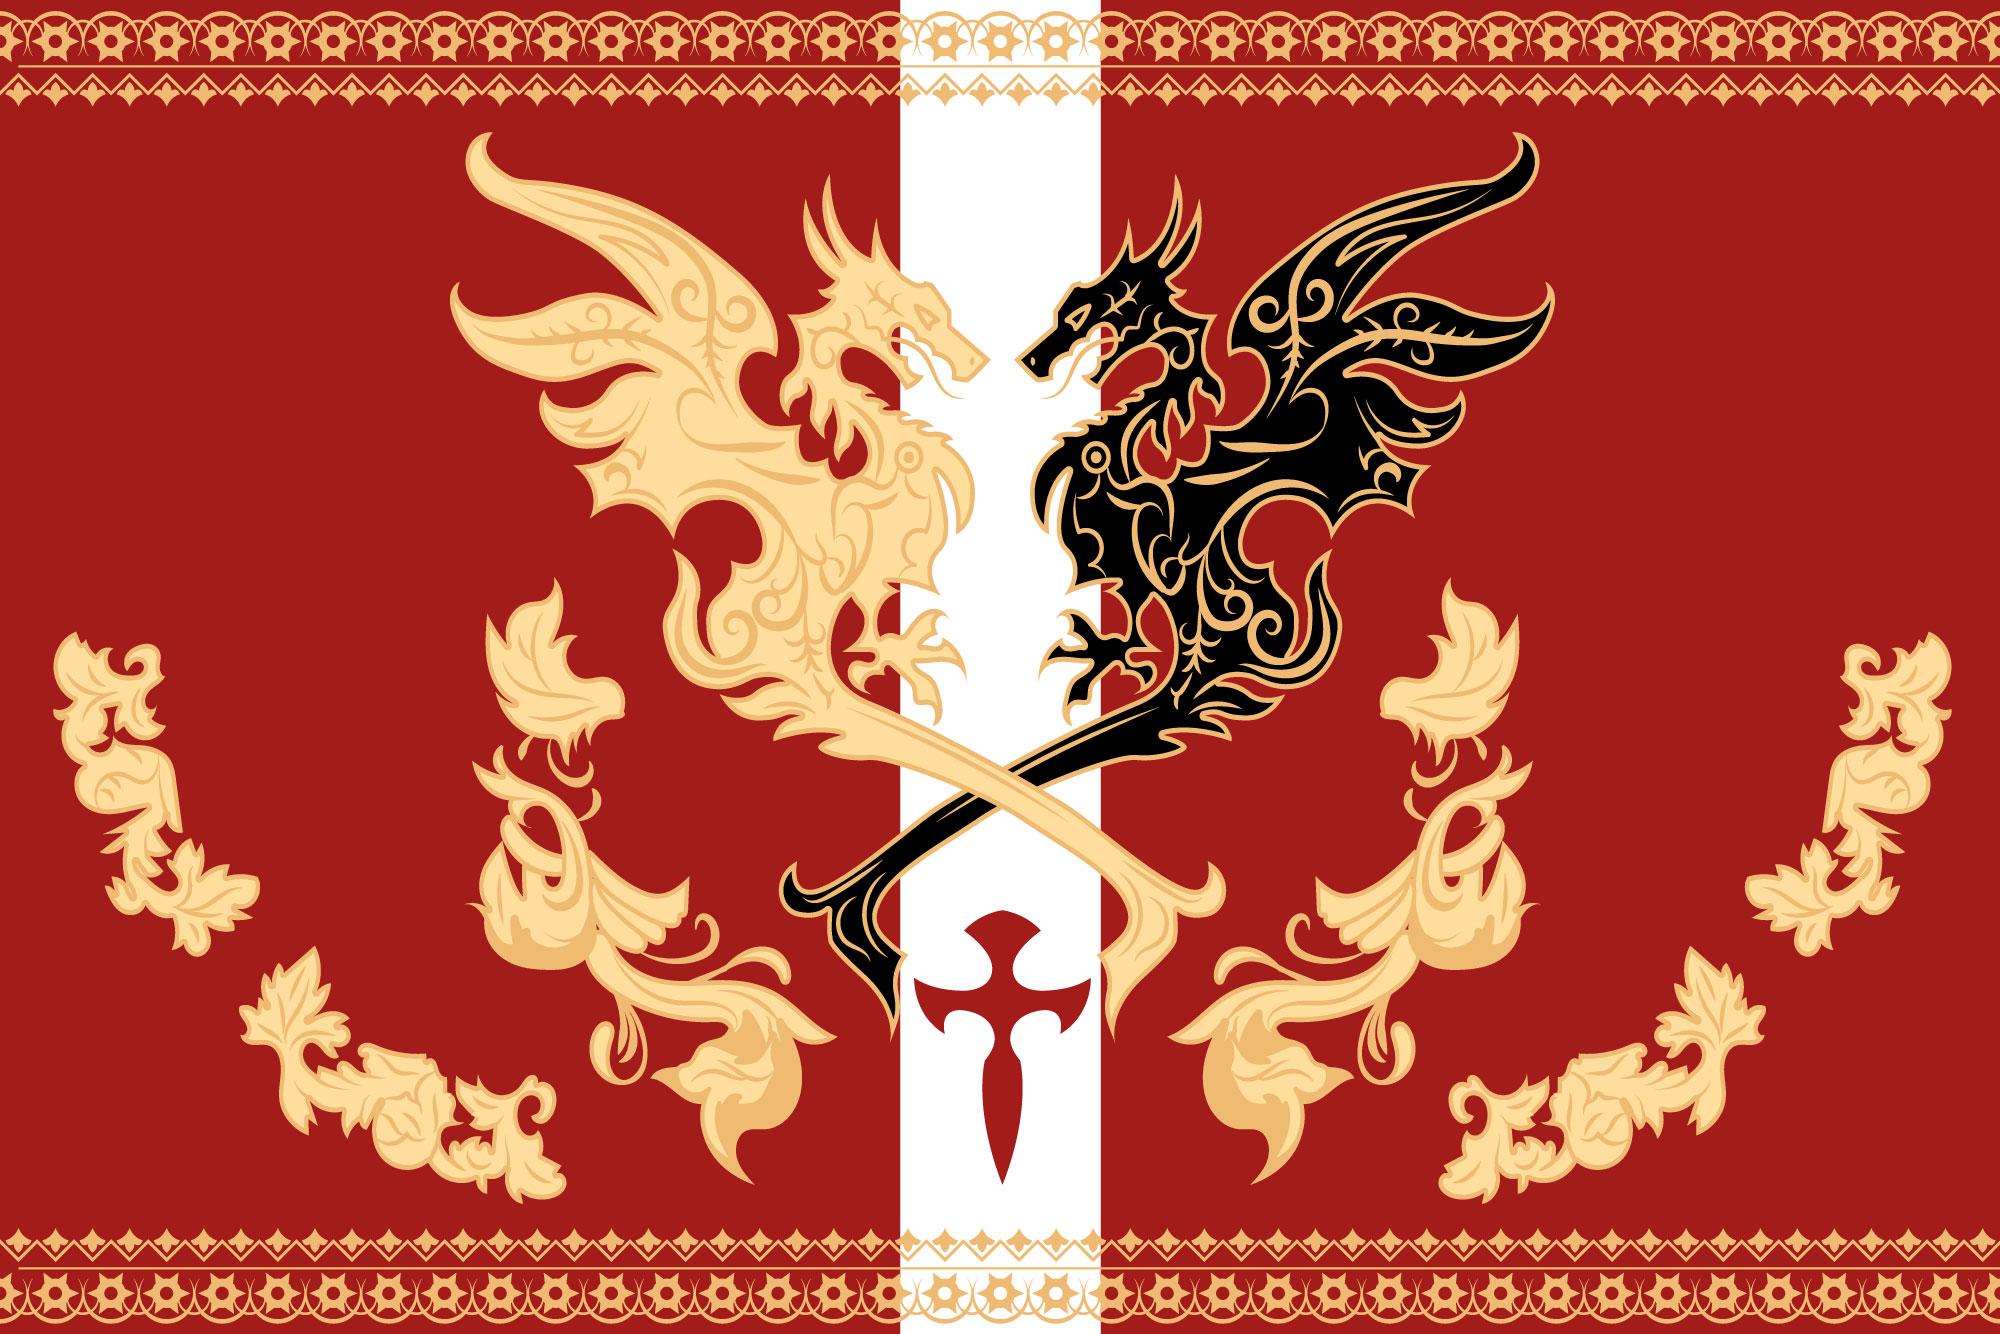 Niflheim empire flag - Final Fantasy XV by SalesWorlds